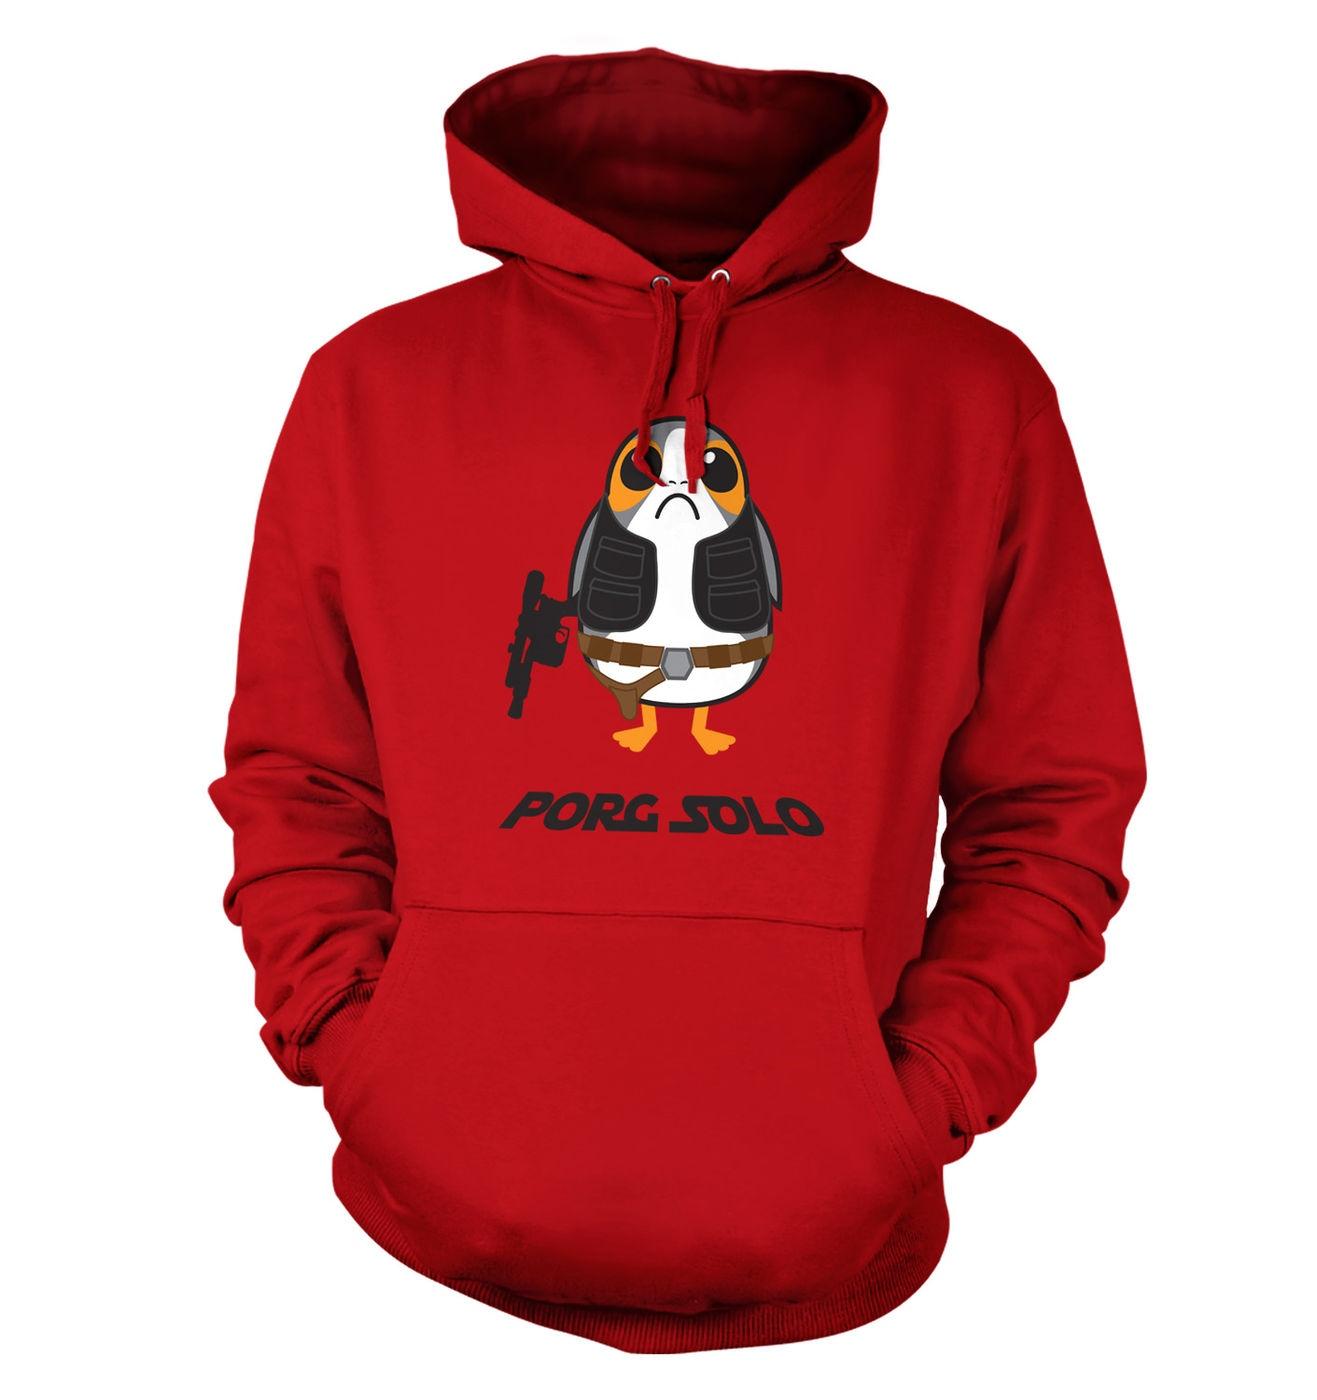 Porg Solo hoodie by Something Geeky